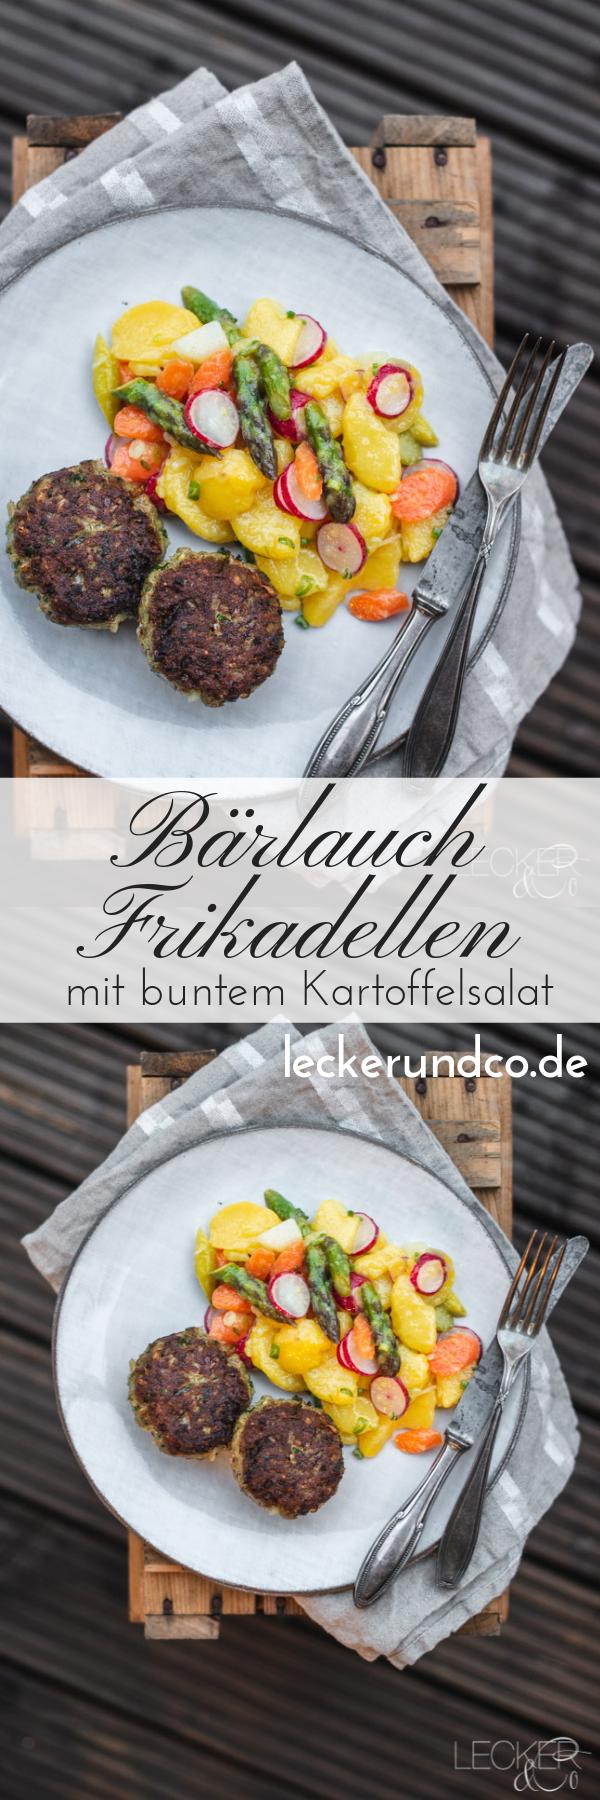 Bärlauchfrikadellen mit buntem Kartoffelsalat | LECKER&Co | Foodblog aus Nürnberg